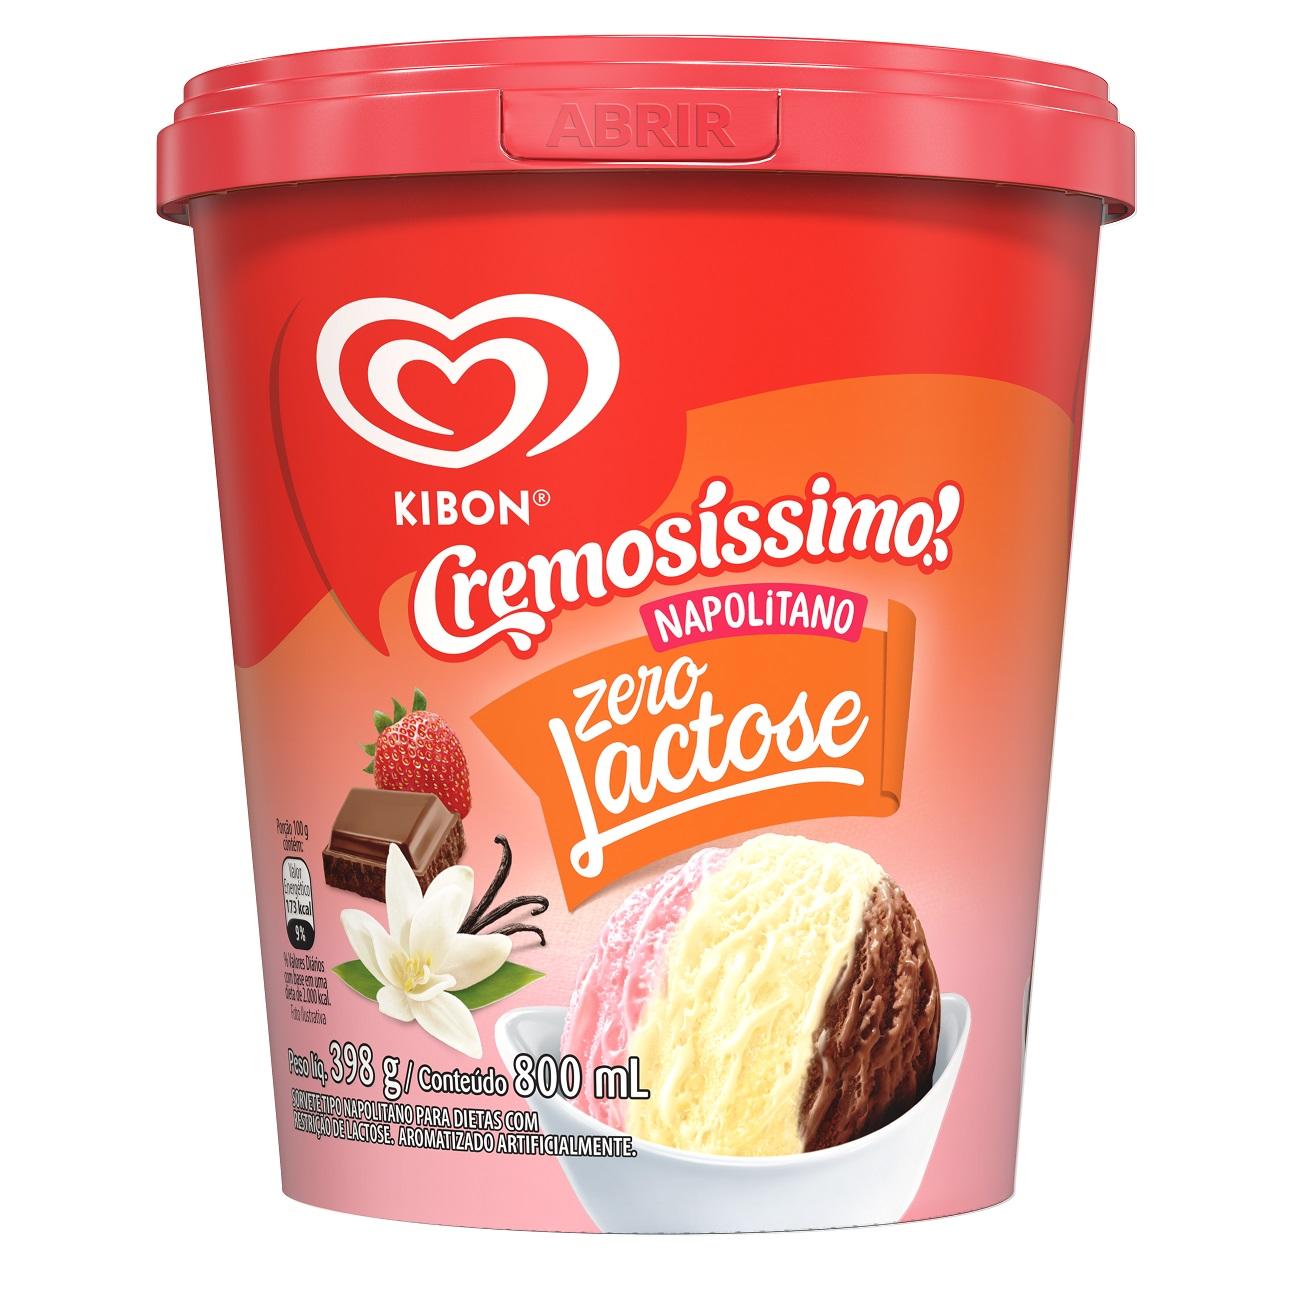 Sorvete Kibon Pote Zero Lactose Cremosíssimo Napolitano 800ML l Caixa com 4